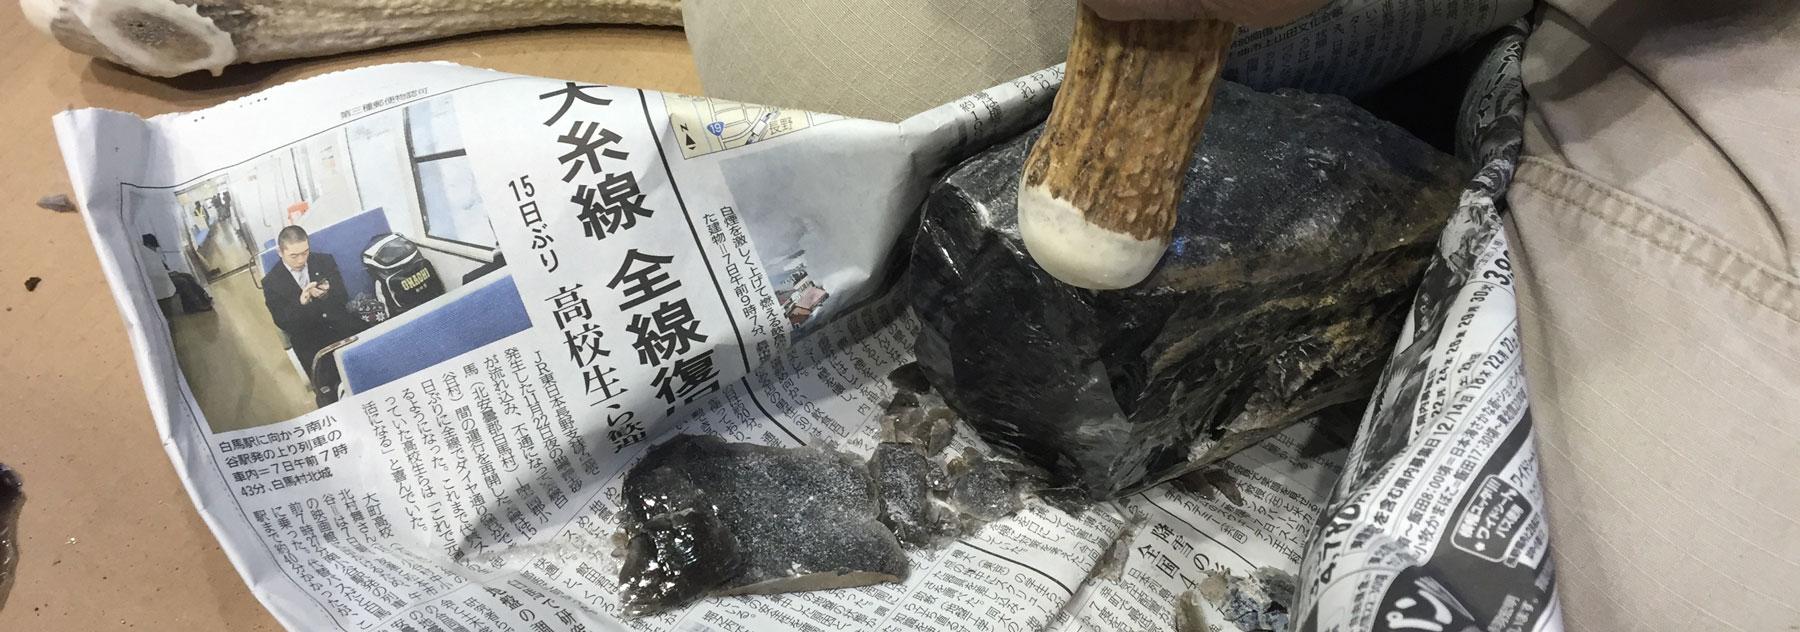 working obsidian